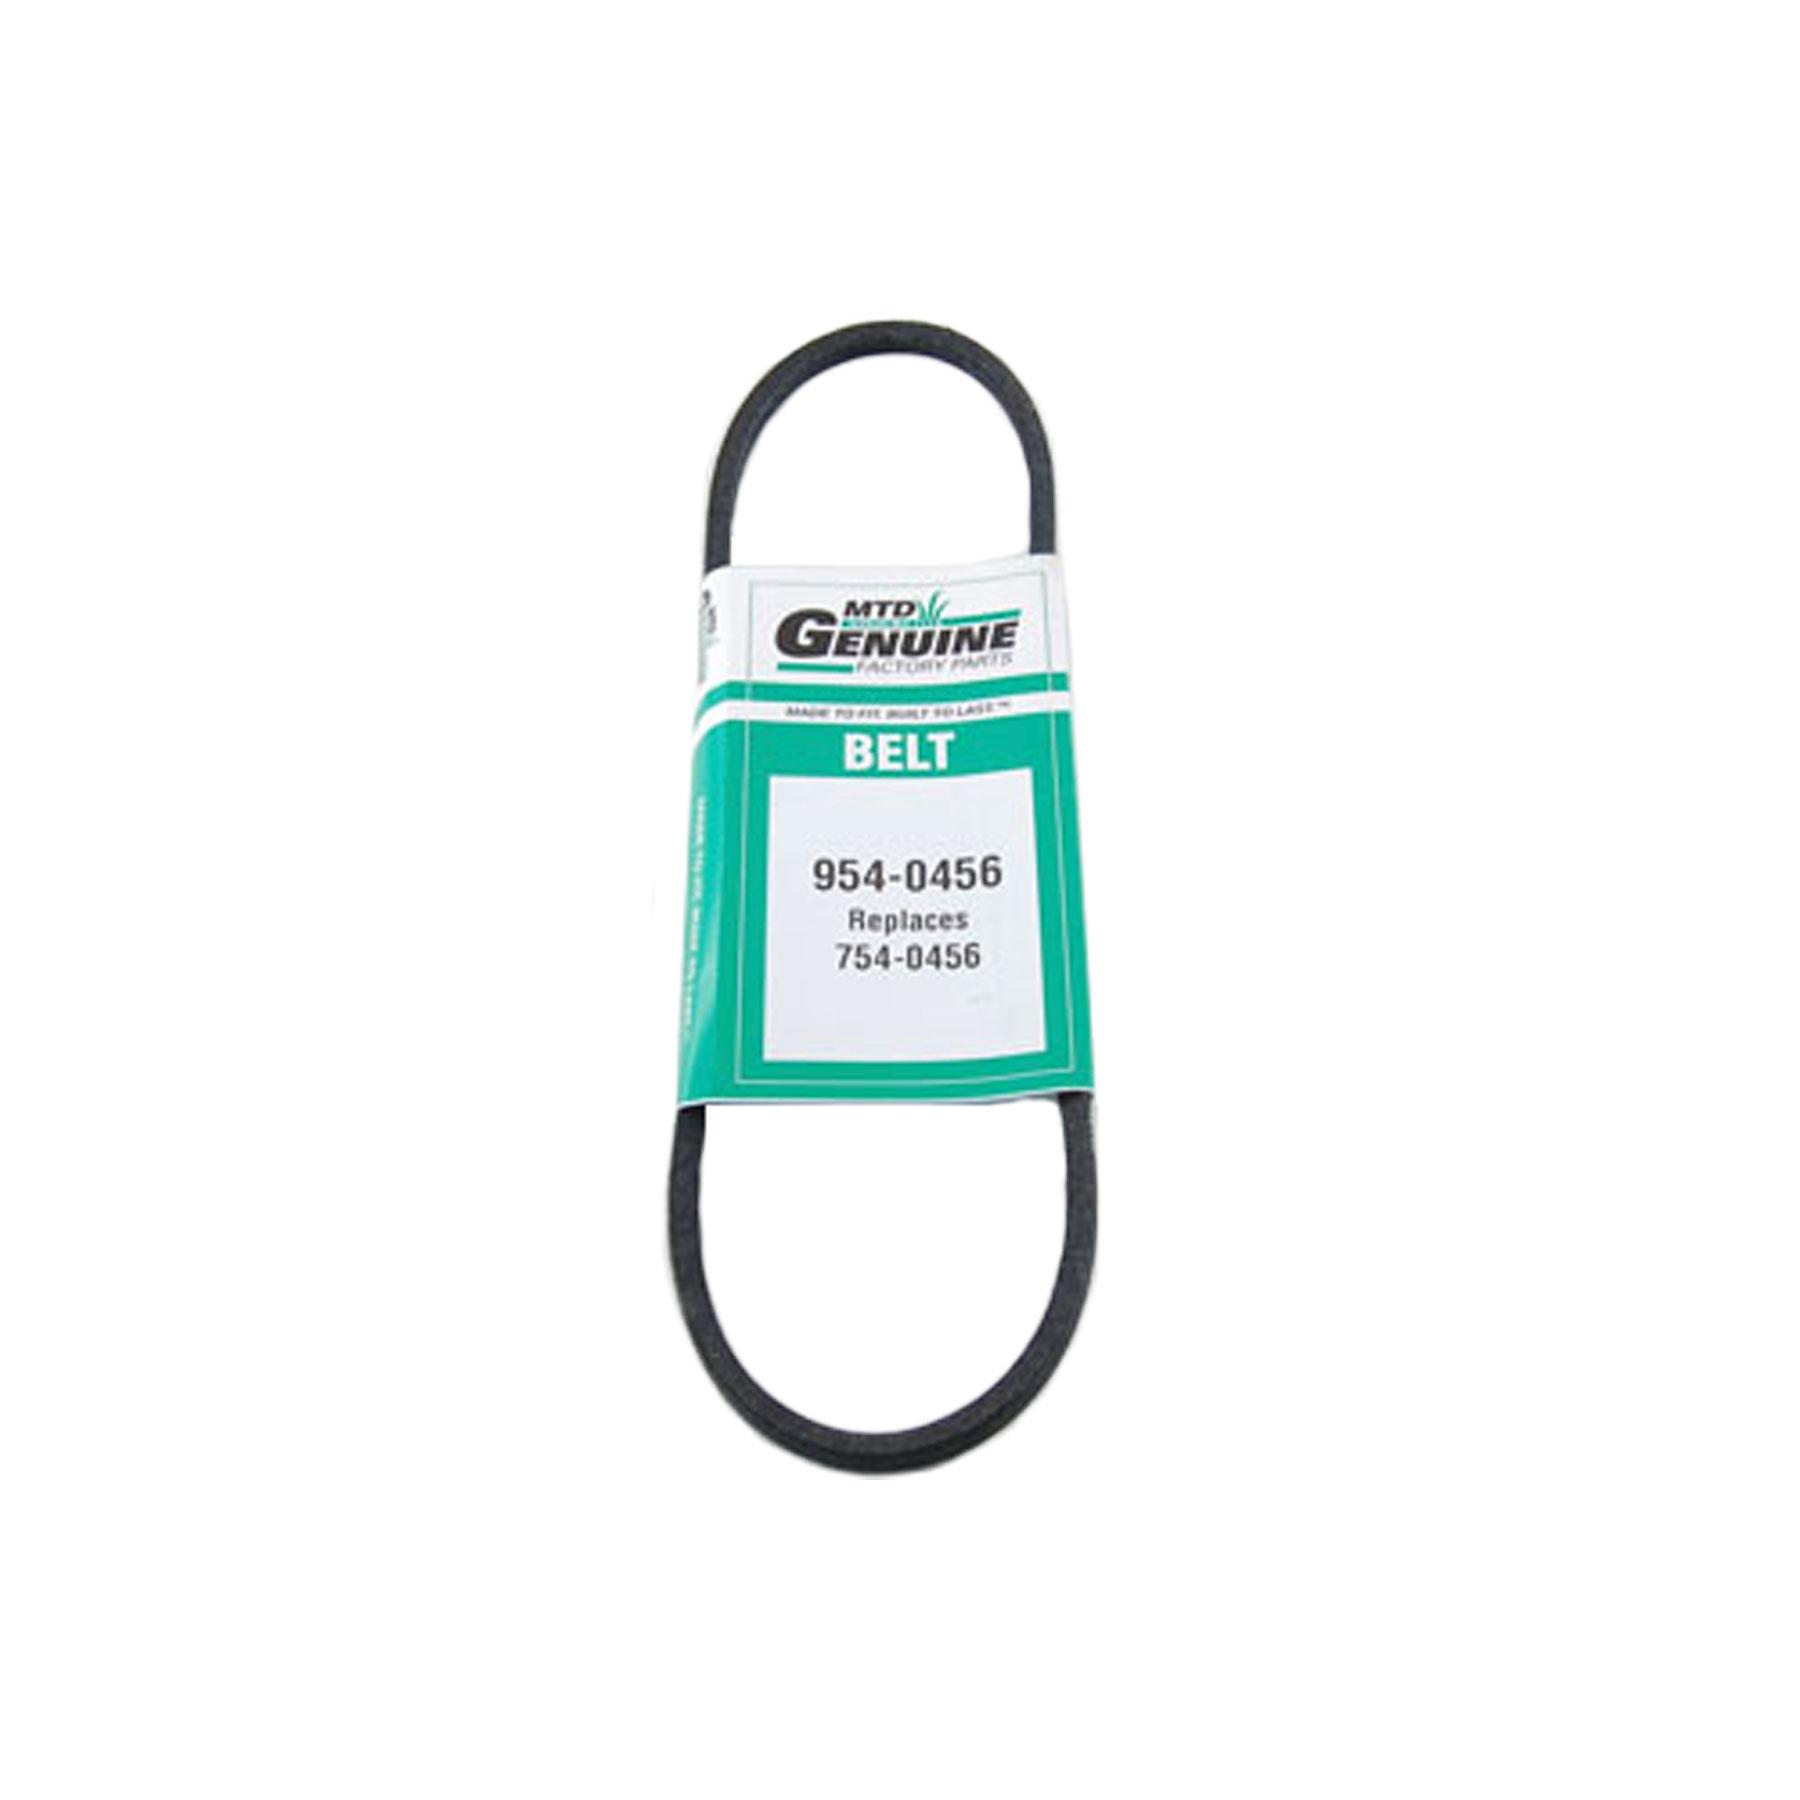 Genuine OEM MTD 754-0456 954-0456 Replacement Belt 3//8 X 29